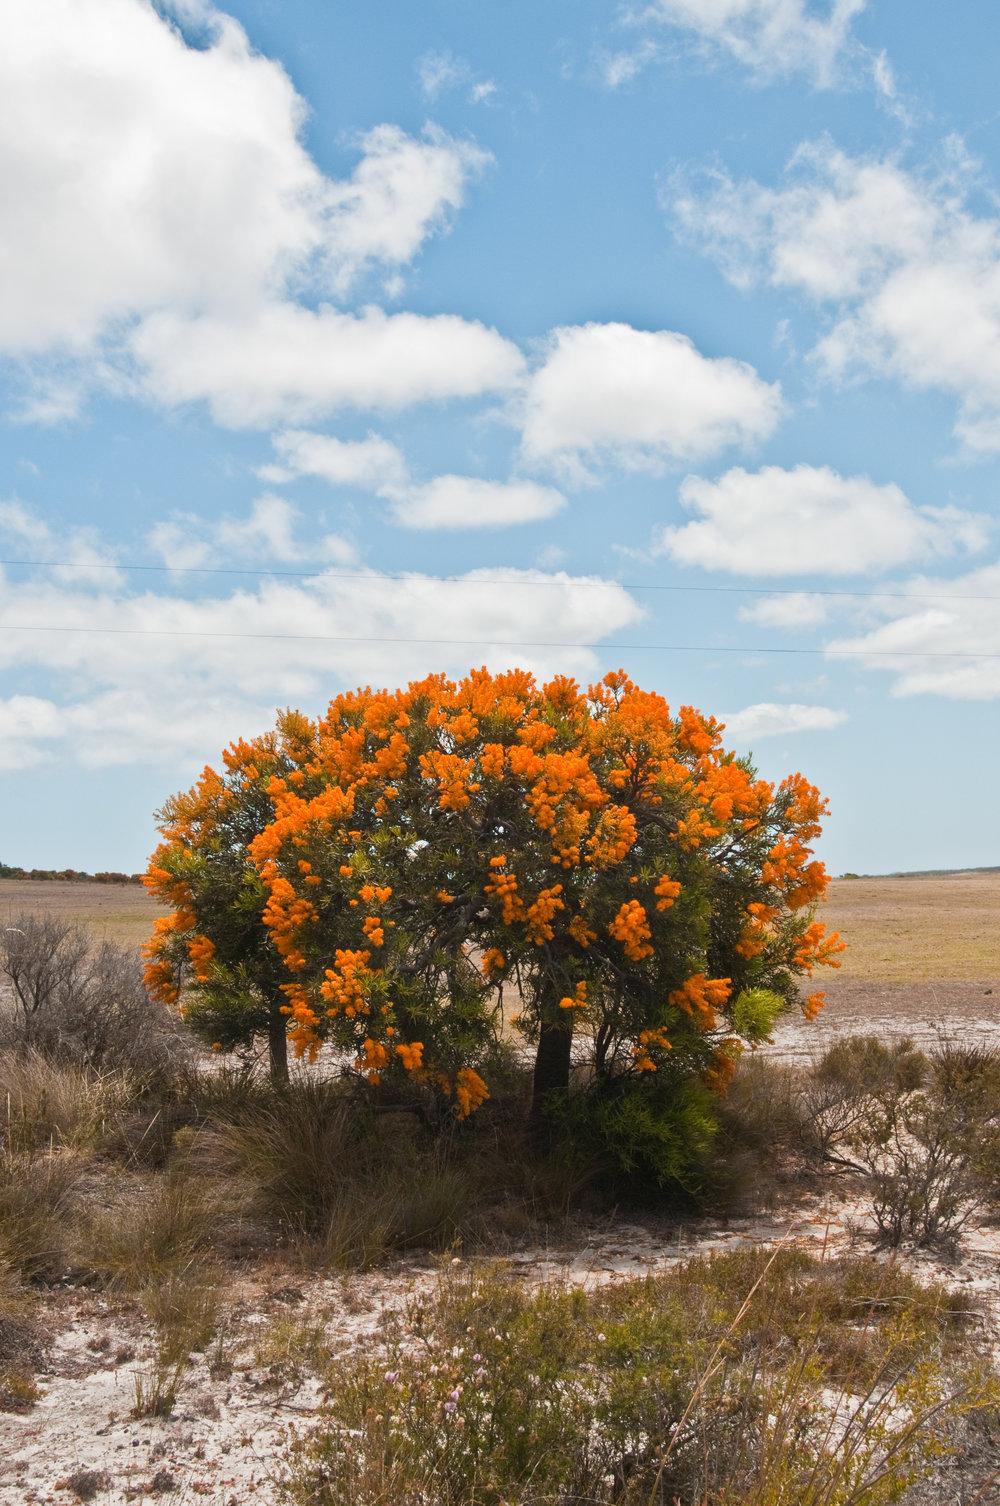 Nuytsia_floribunda_-_The_Australian_Mistletoe.jpg